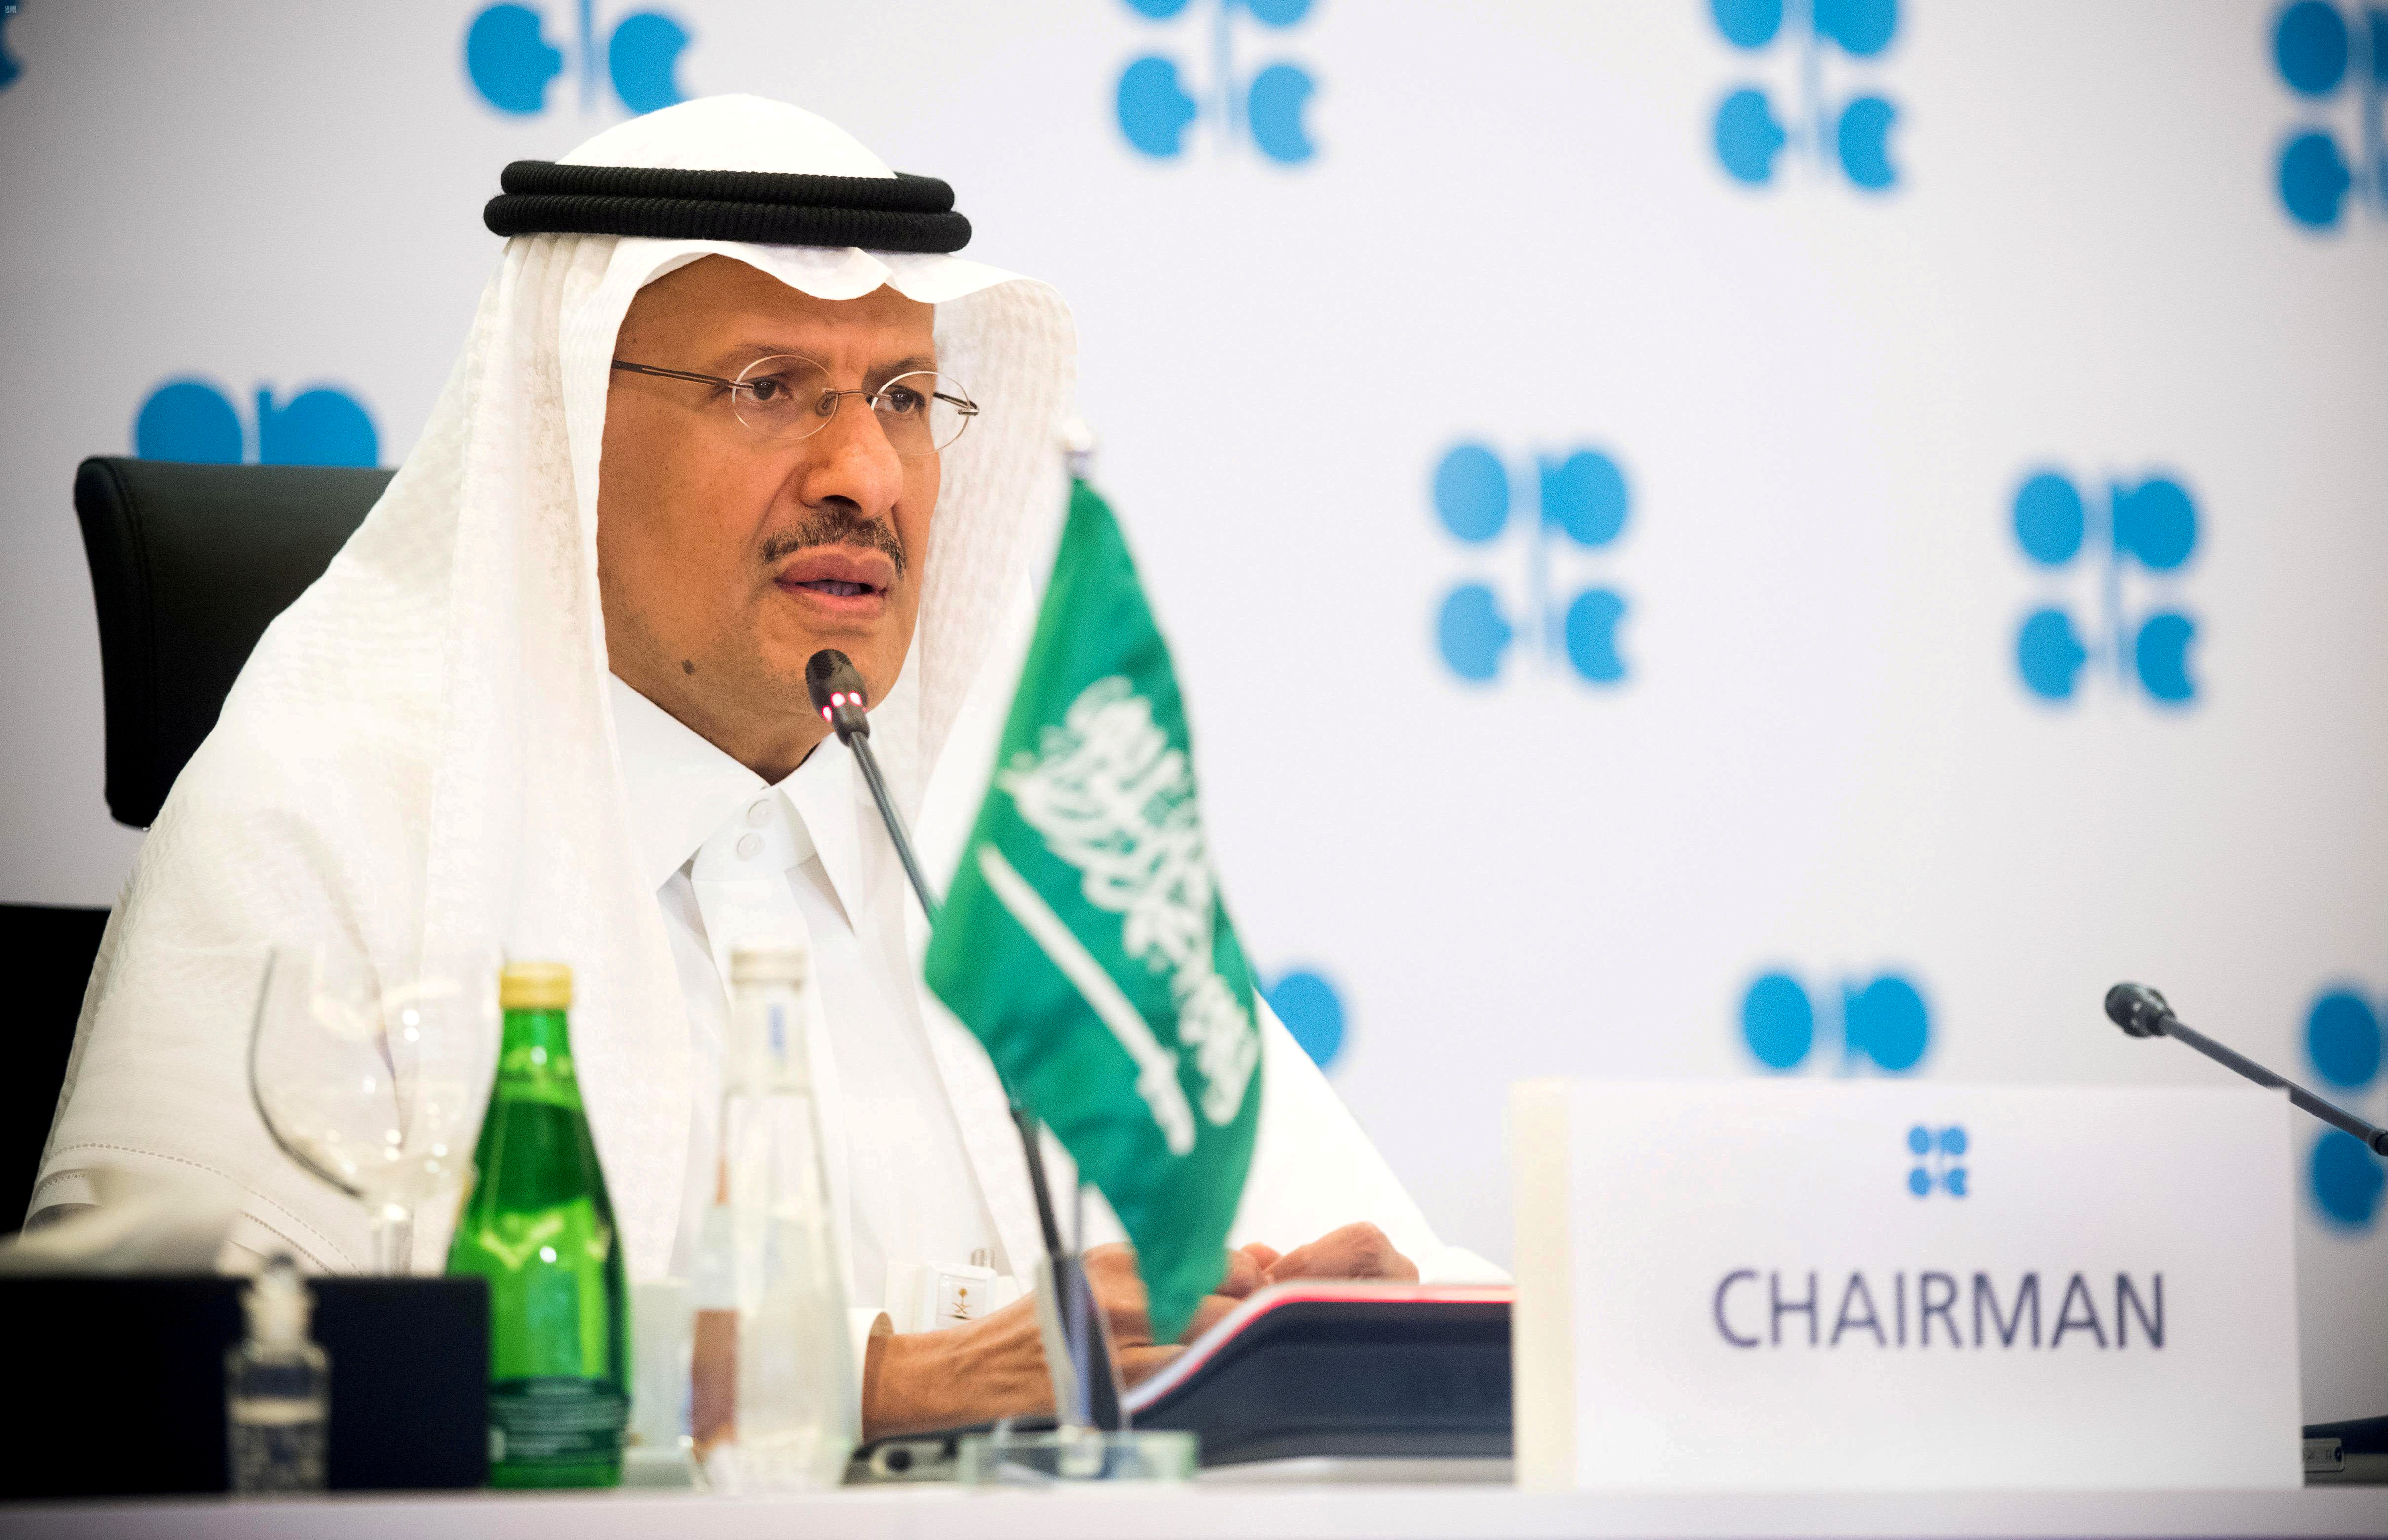 Saudi Arabia's Minister of Energy Prince Abdulaziz bin Salman Al-Saud speaks via video link during a virtual emergency meeting of OPEC and non-OPEC countries, following the outbreak of the coronavirus disease (COVID-19), in Riyadh, Saudi Arabia April 9, 2020.Saudi Press Agency/Handout via REUTERS